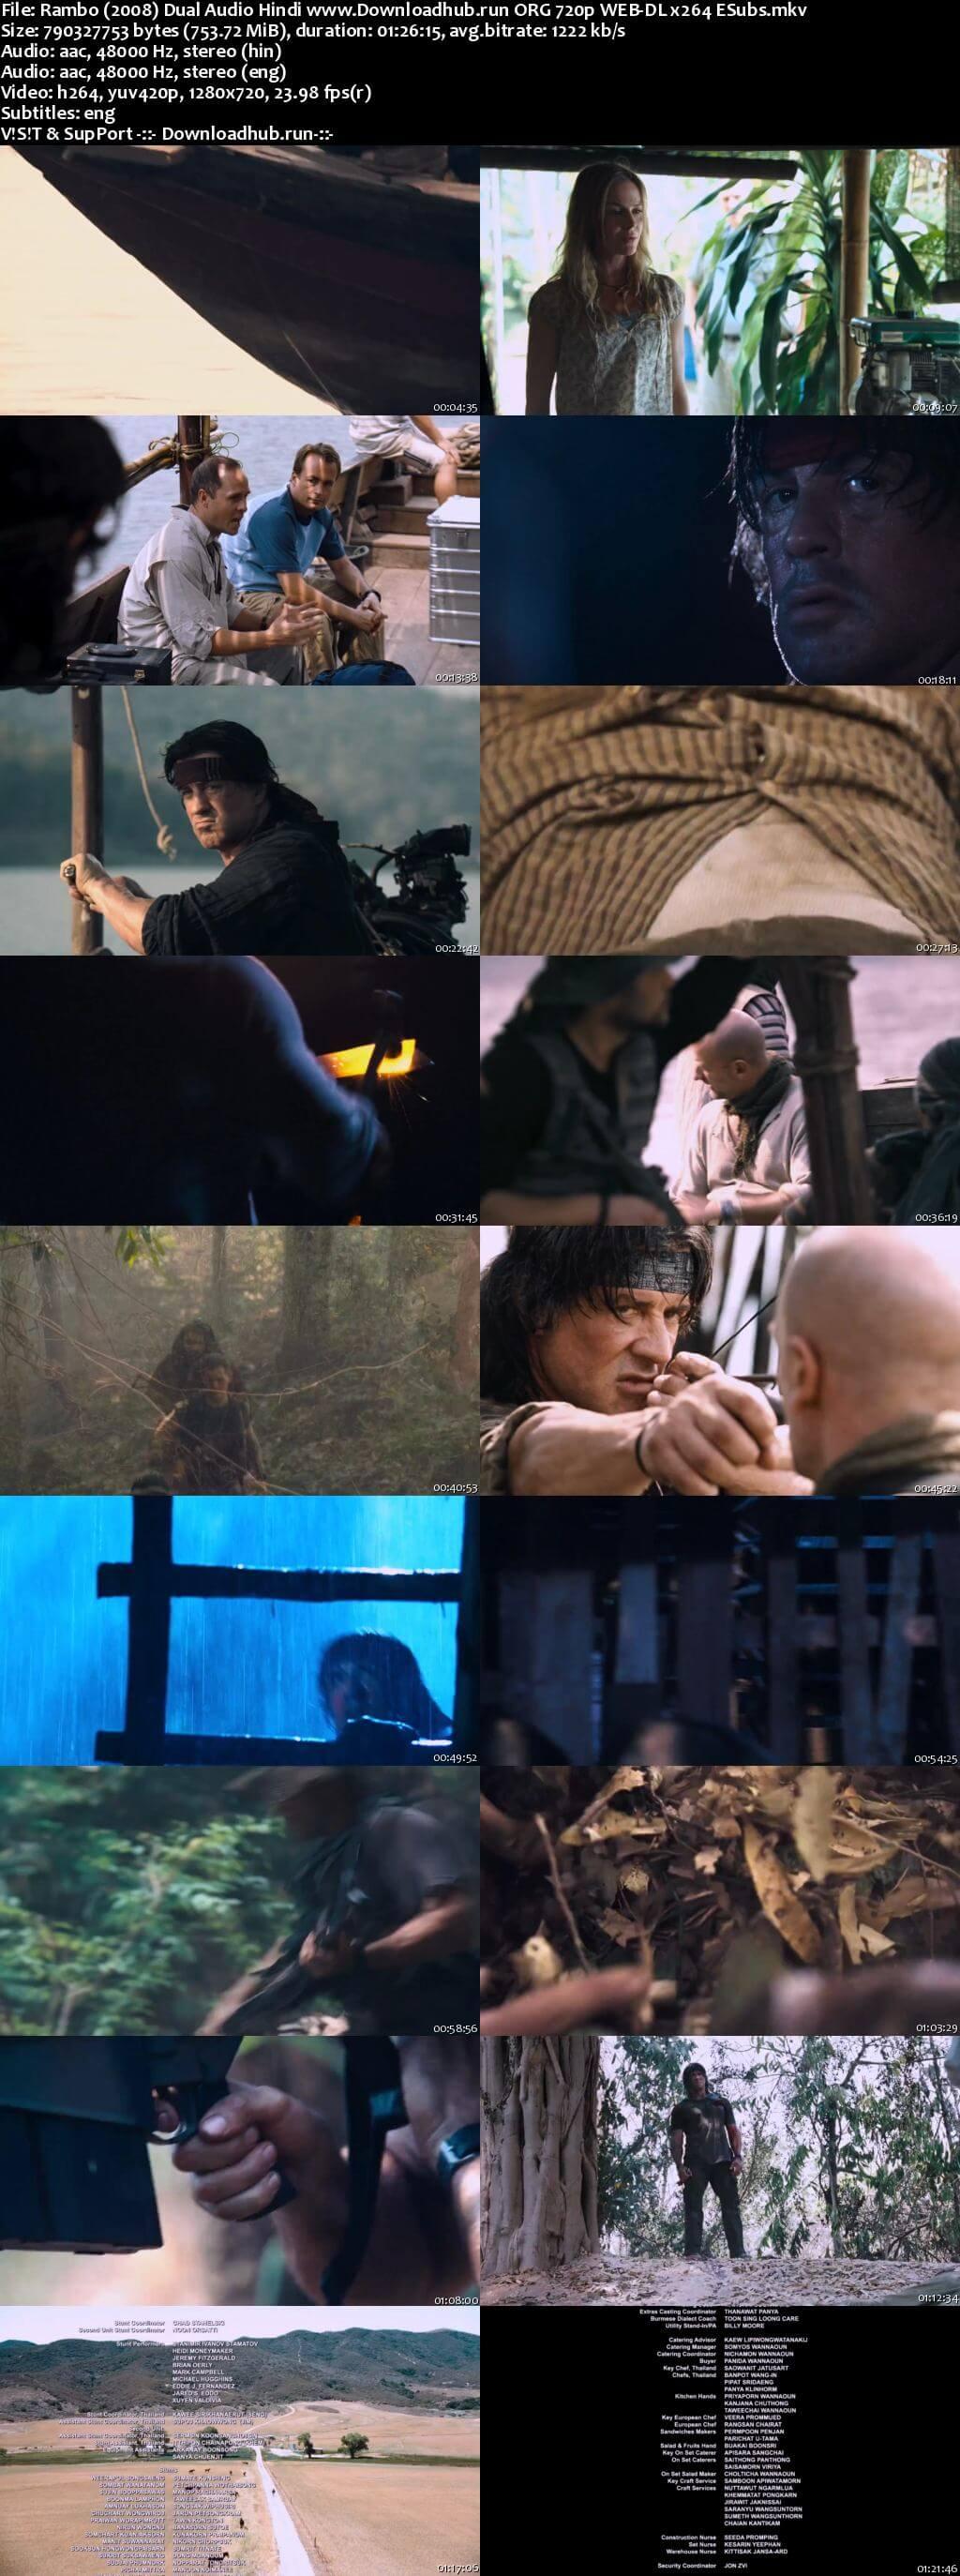 Rambo 2008 Hindi Dual Audio 720p Web-DL ESubs